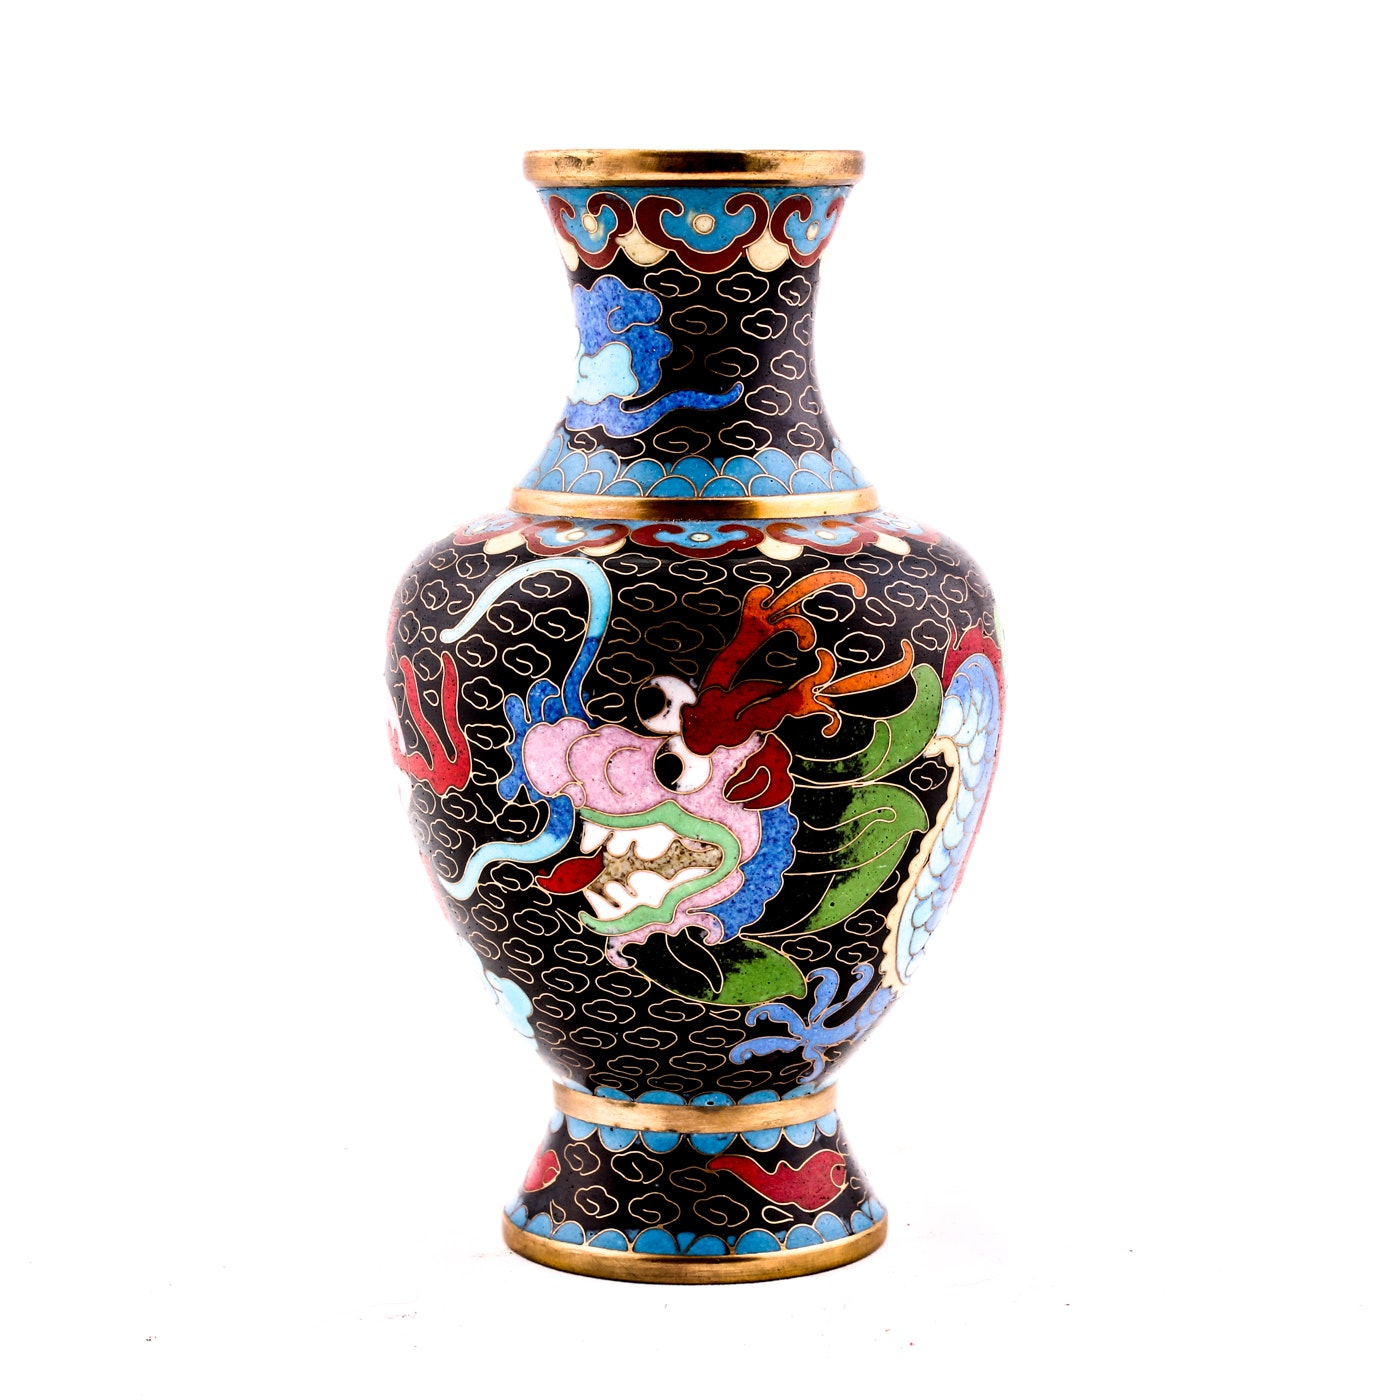 Vintage Chinese Cloisonné Dragon Chasing Flaming Pearl Vase